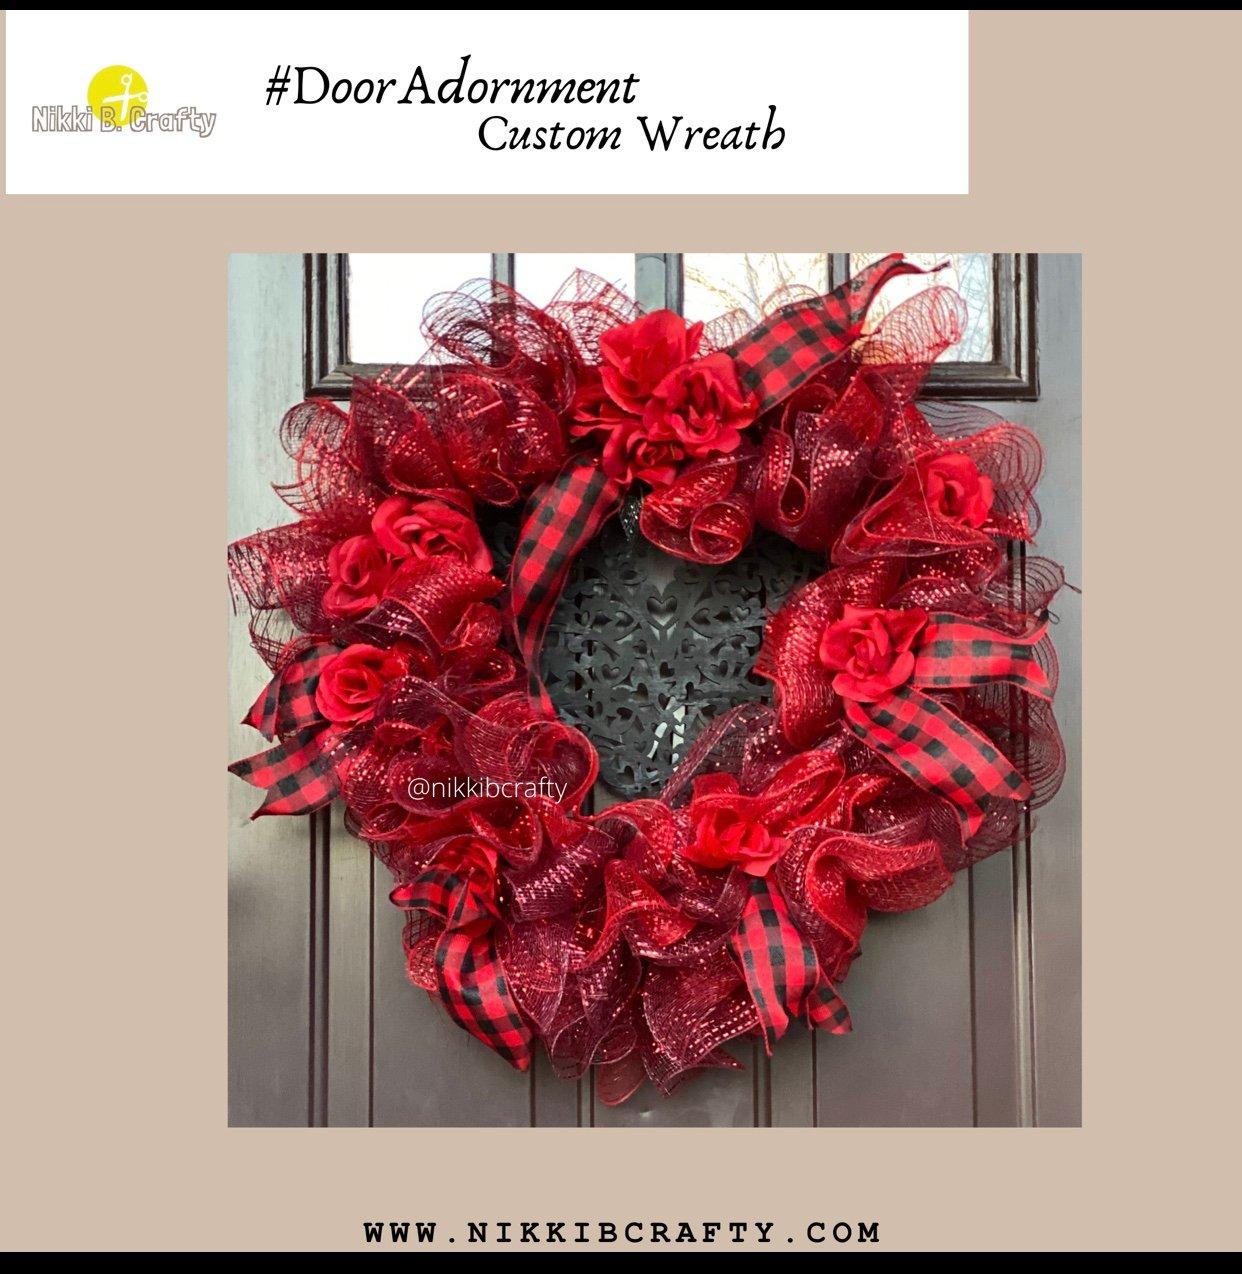 Image of Festive Wreaths